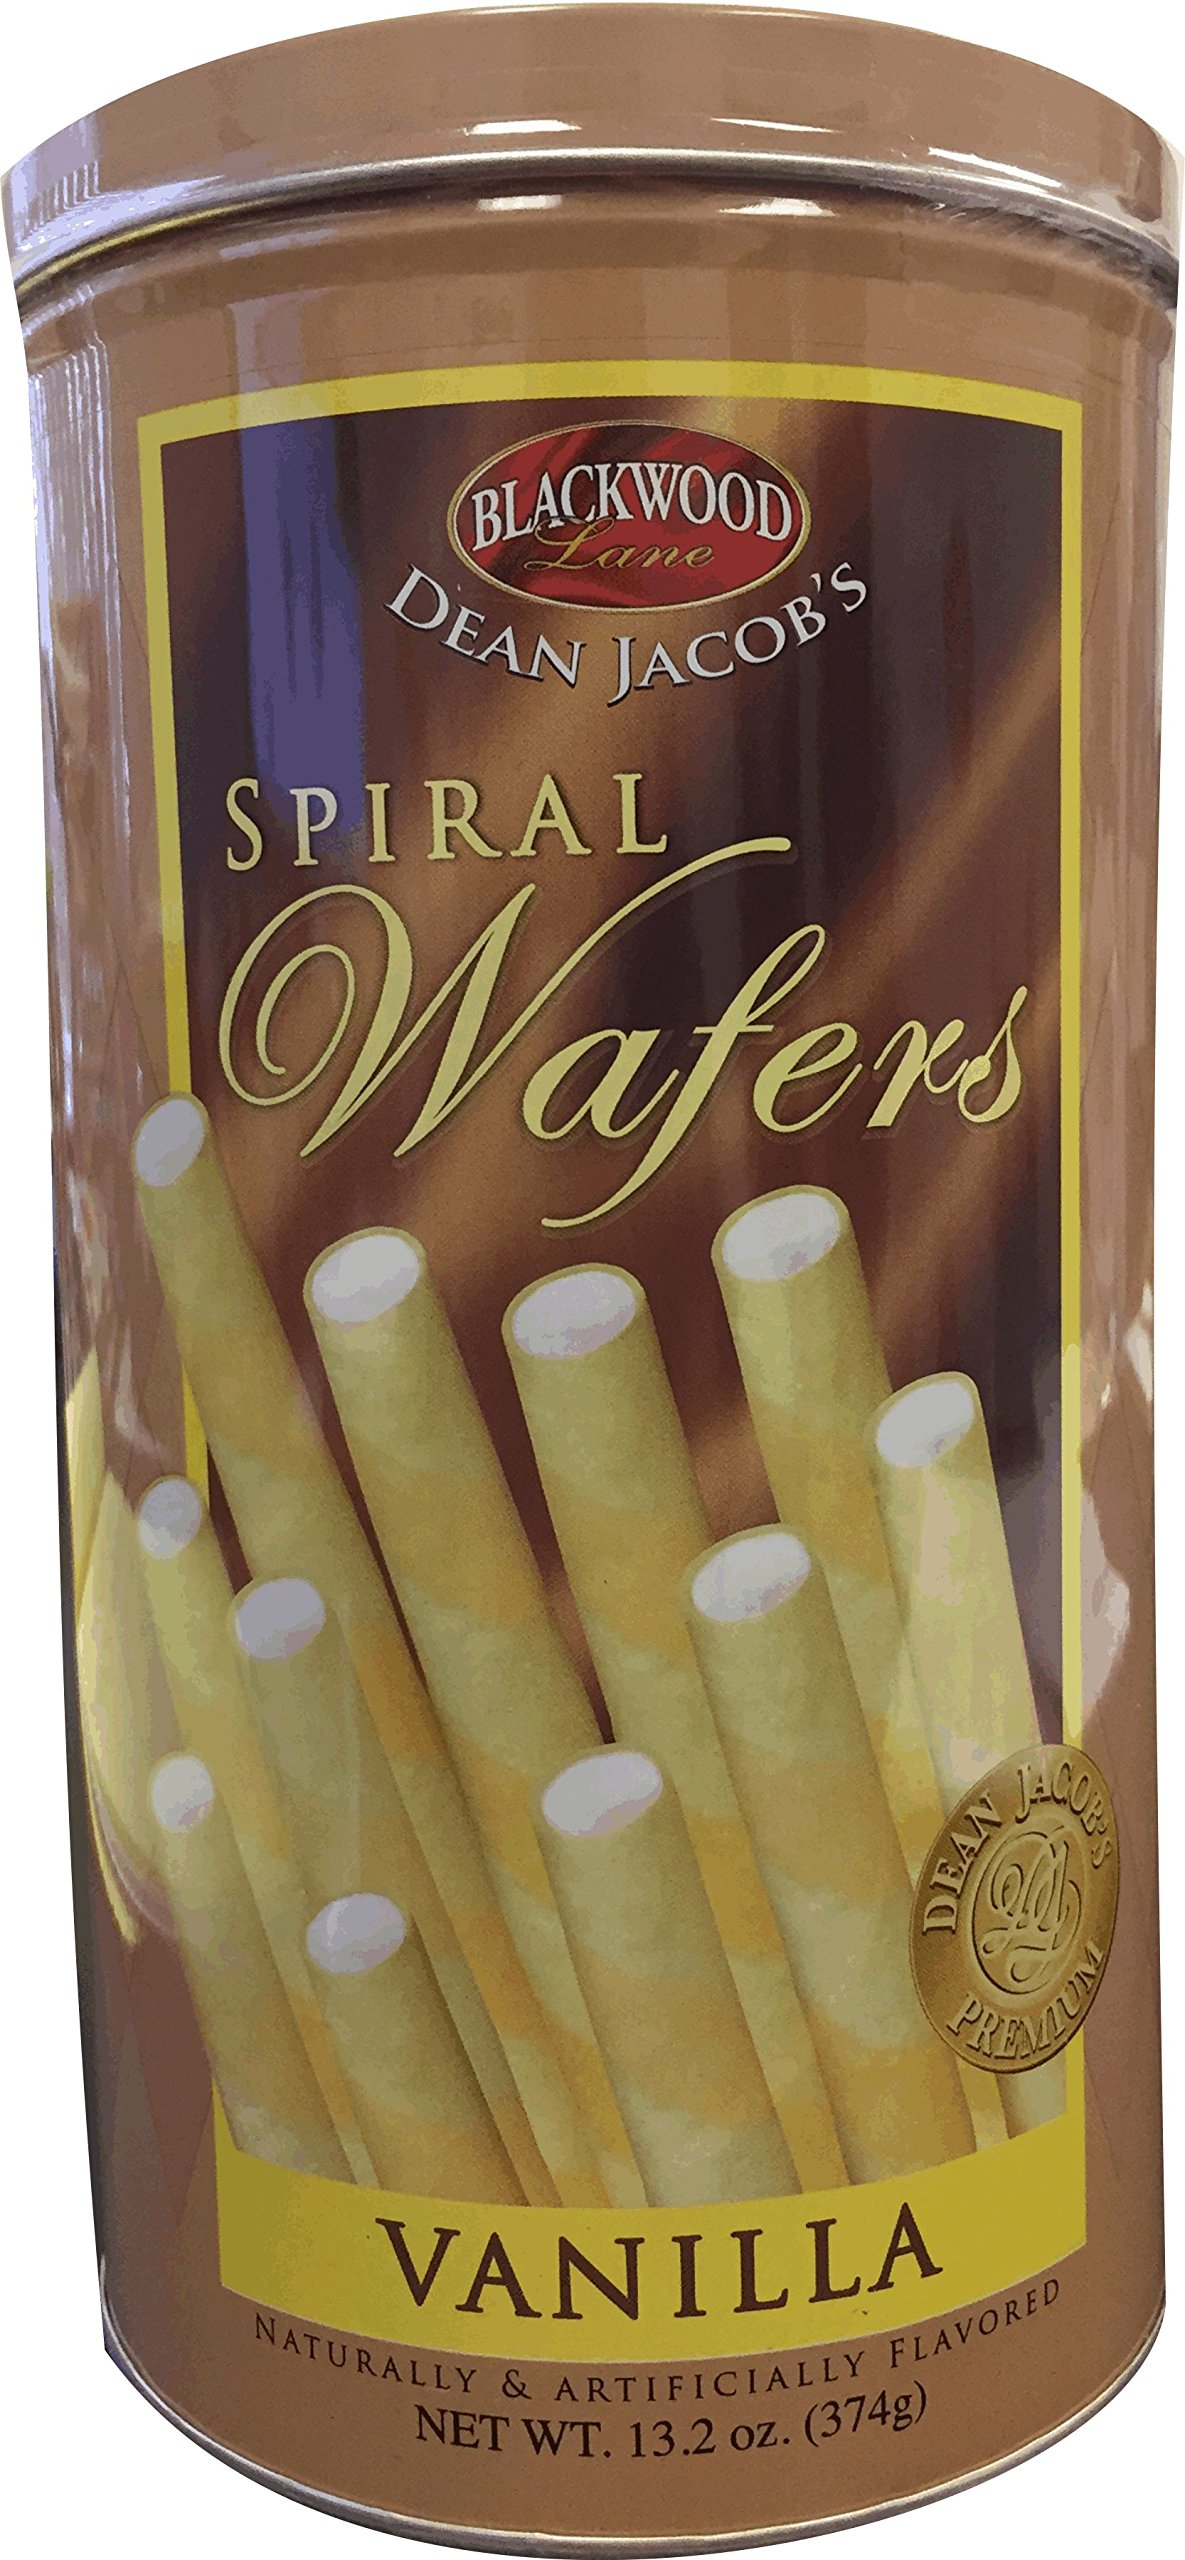 Dean Jacob's Blackwood Lane Vanilla Spiral Wafers (Pack of 3)